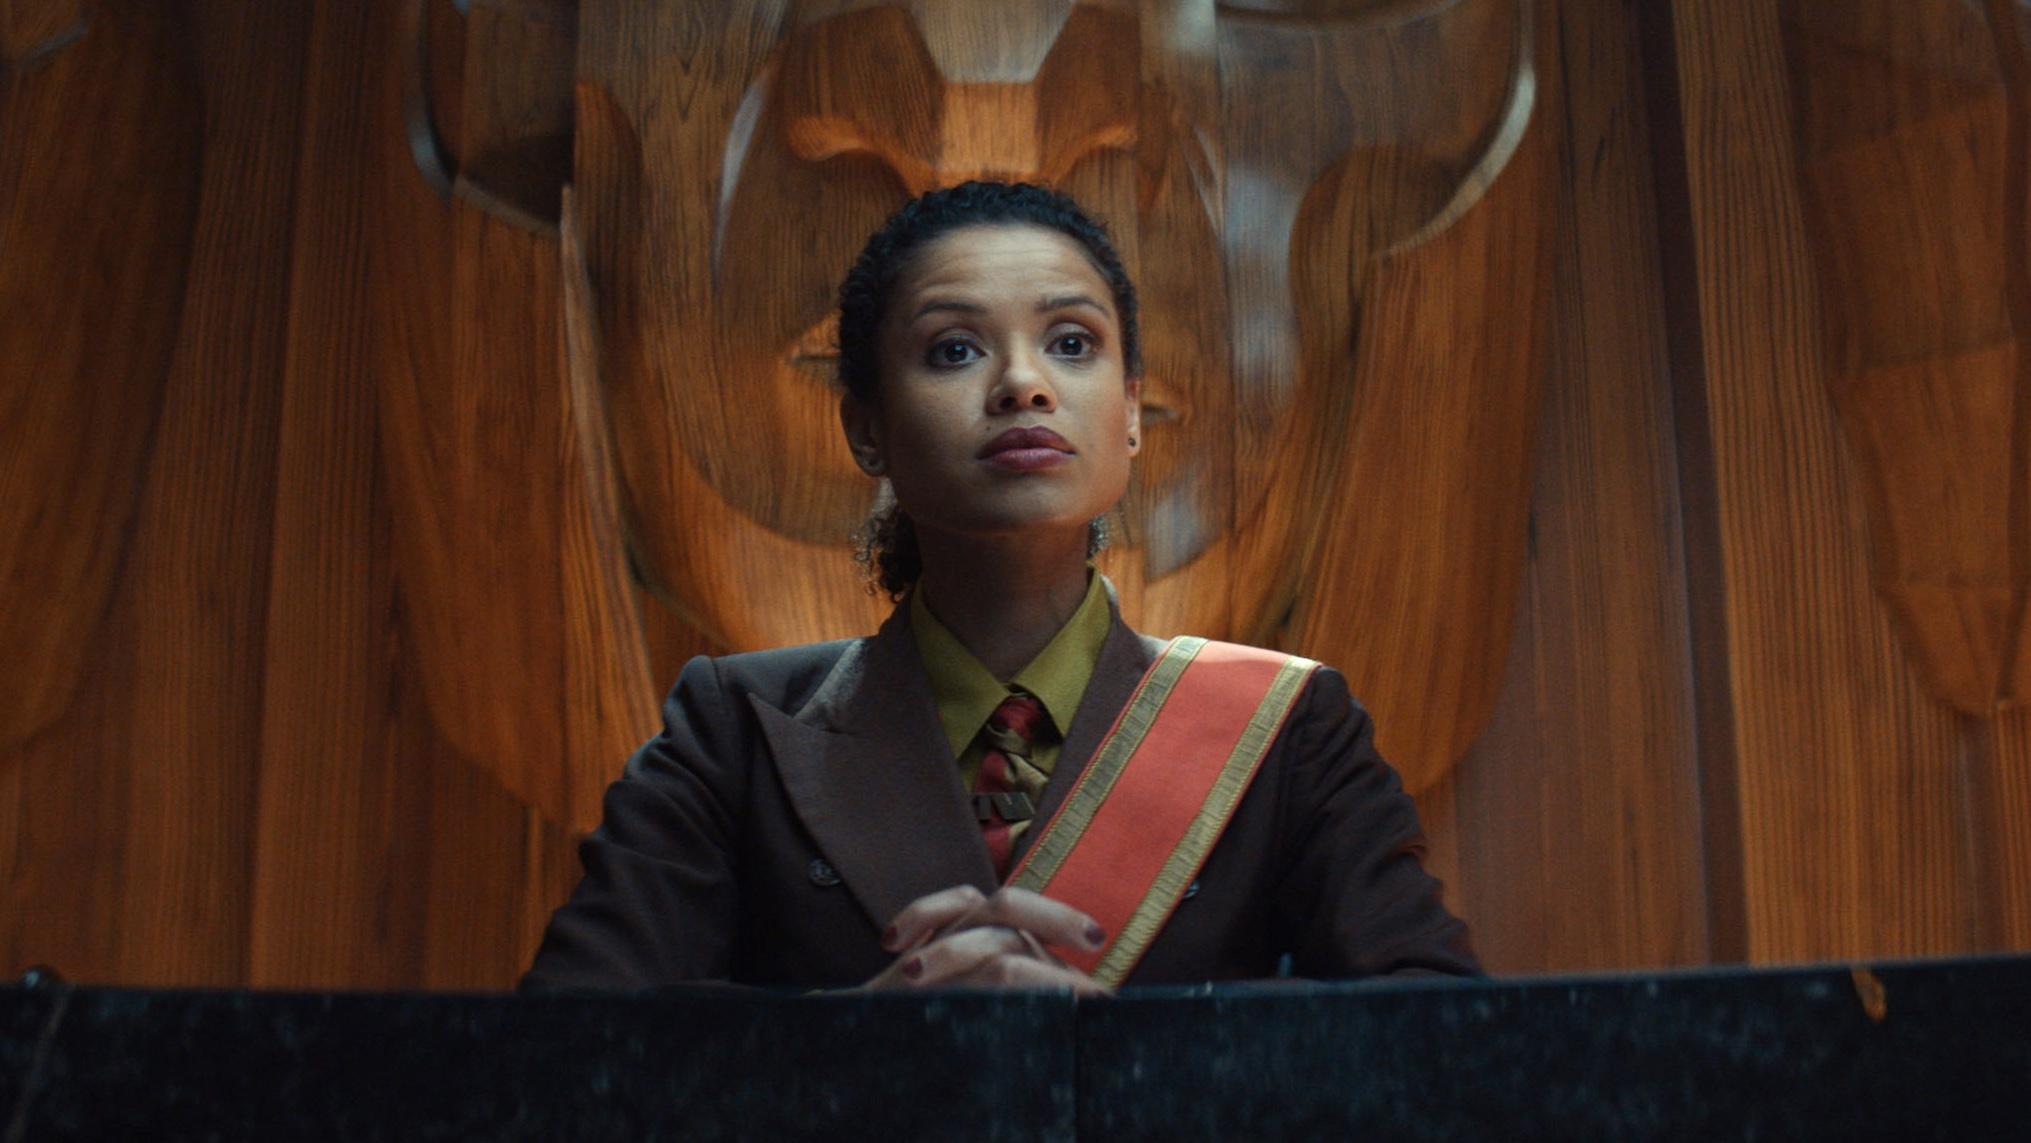 Loki TV series characters — Ravonna Lexus Renslayer (played by Gugu Mbatha-Raw)